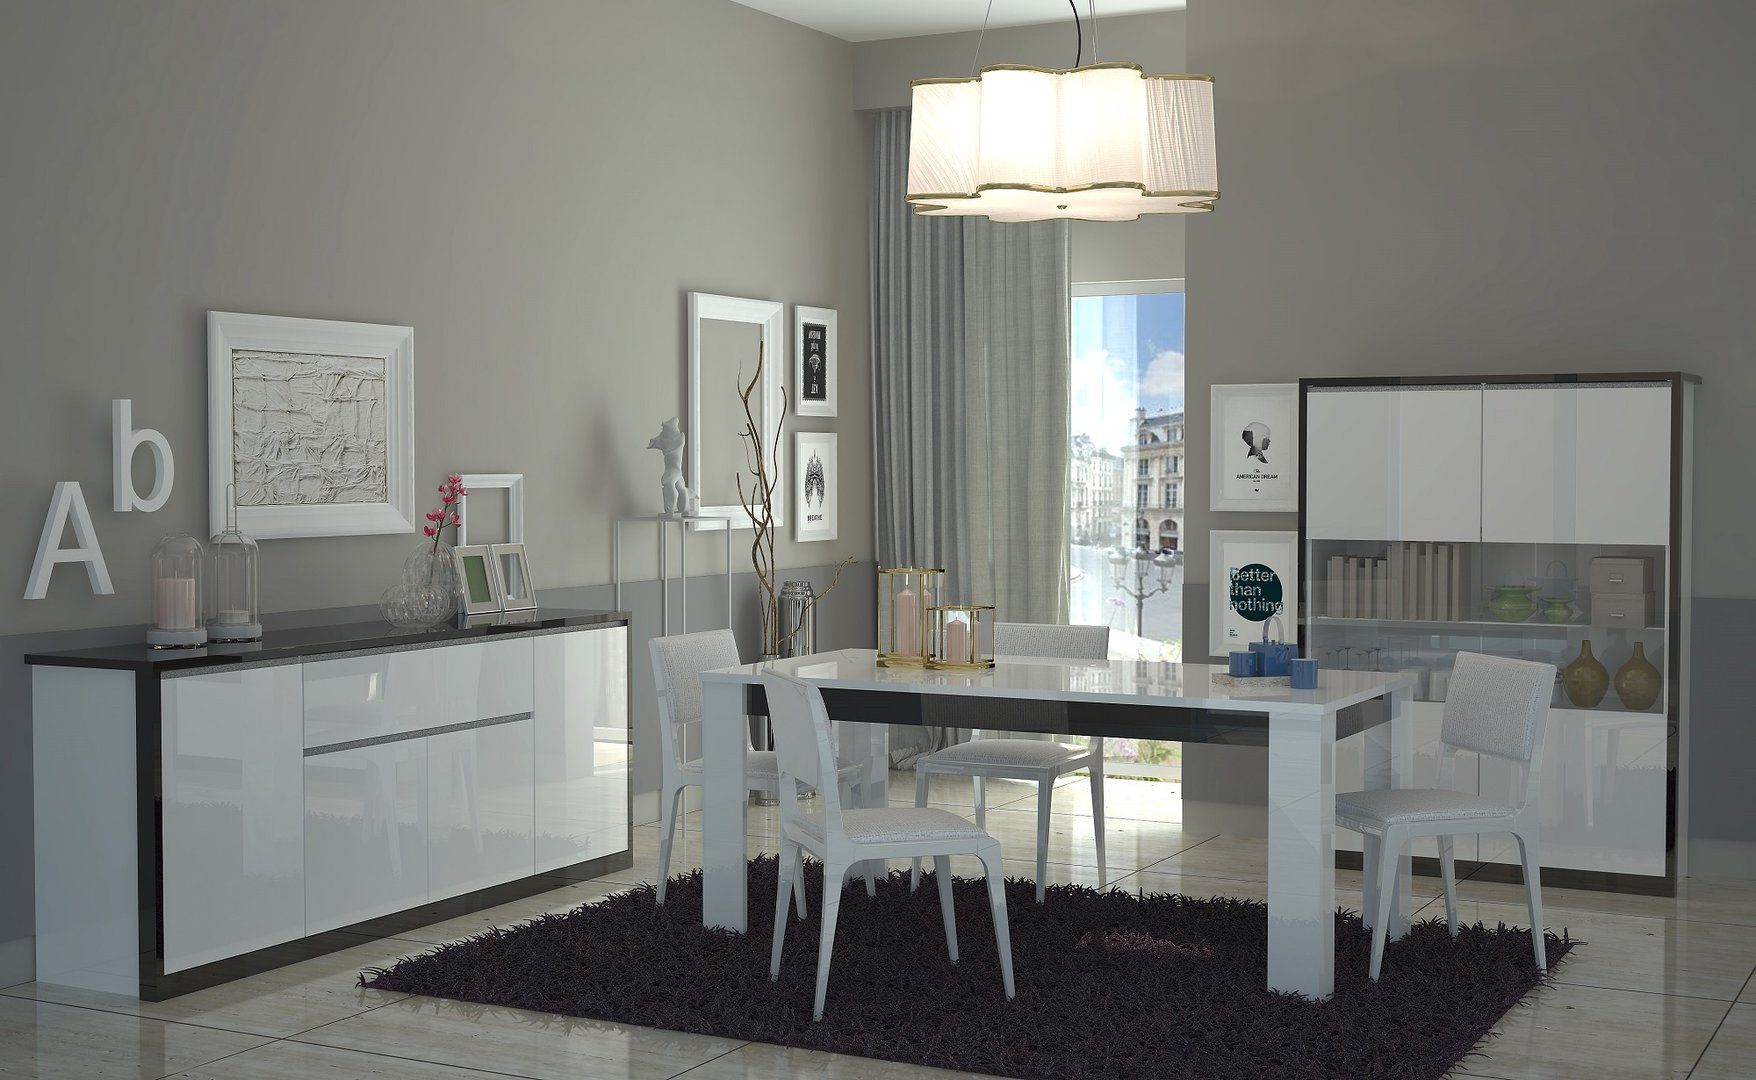 https://www.arredions.com/WebRoot/StoreIT4/Shops/103524/5820/39CD/B6F4/2A18/B87C/0A0A/B011/C3E8/Tavolo_moderno_collezione_Avana_mobile_soggiorno_cucina_sala_da_pranzo_bianco_design_di_Elbectrade_5.jpg